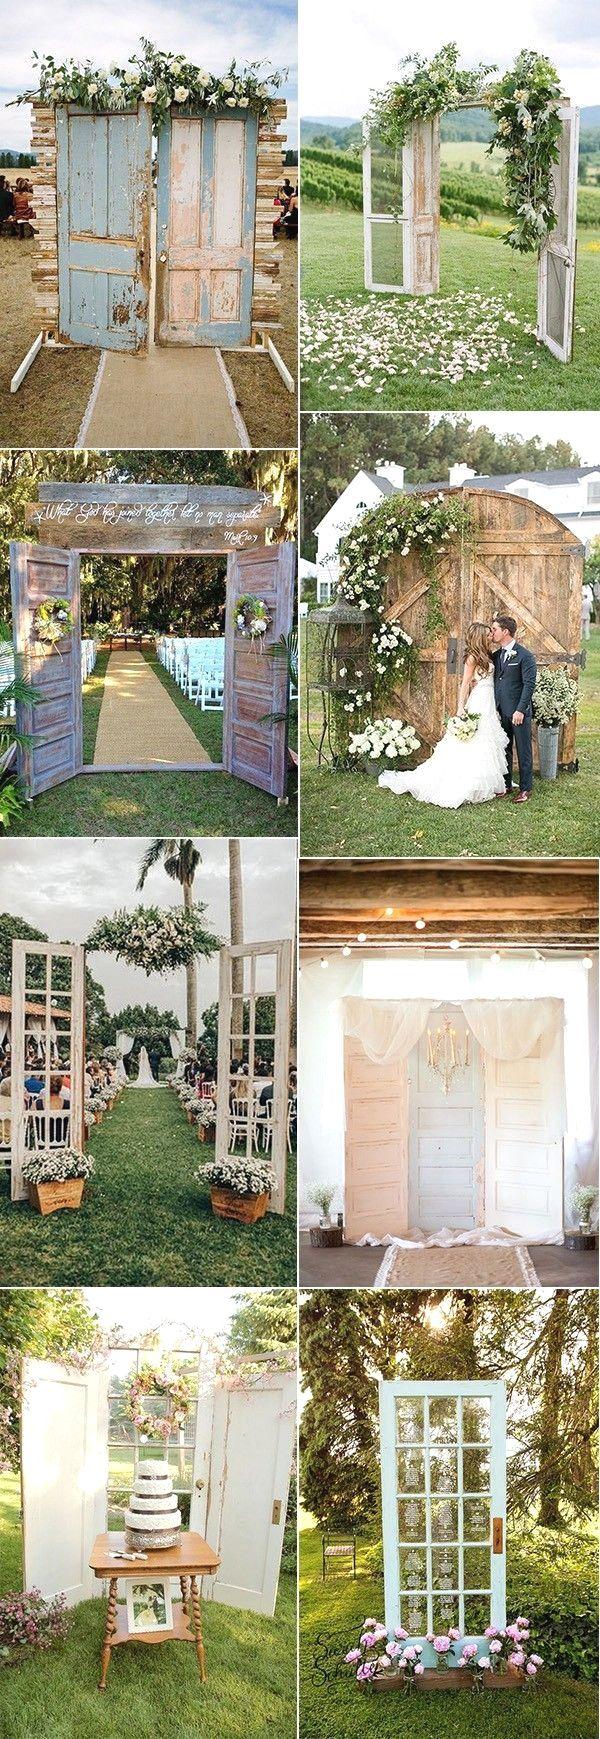 Outdoor Wedding Decoration In 2020 Rustic Wedding Decor Wedding Arches Outdoors Rustic Outdoor Wedding